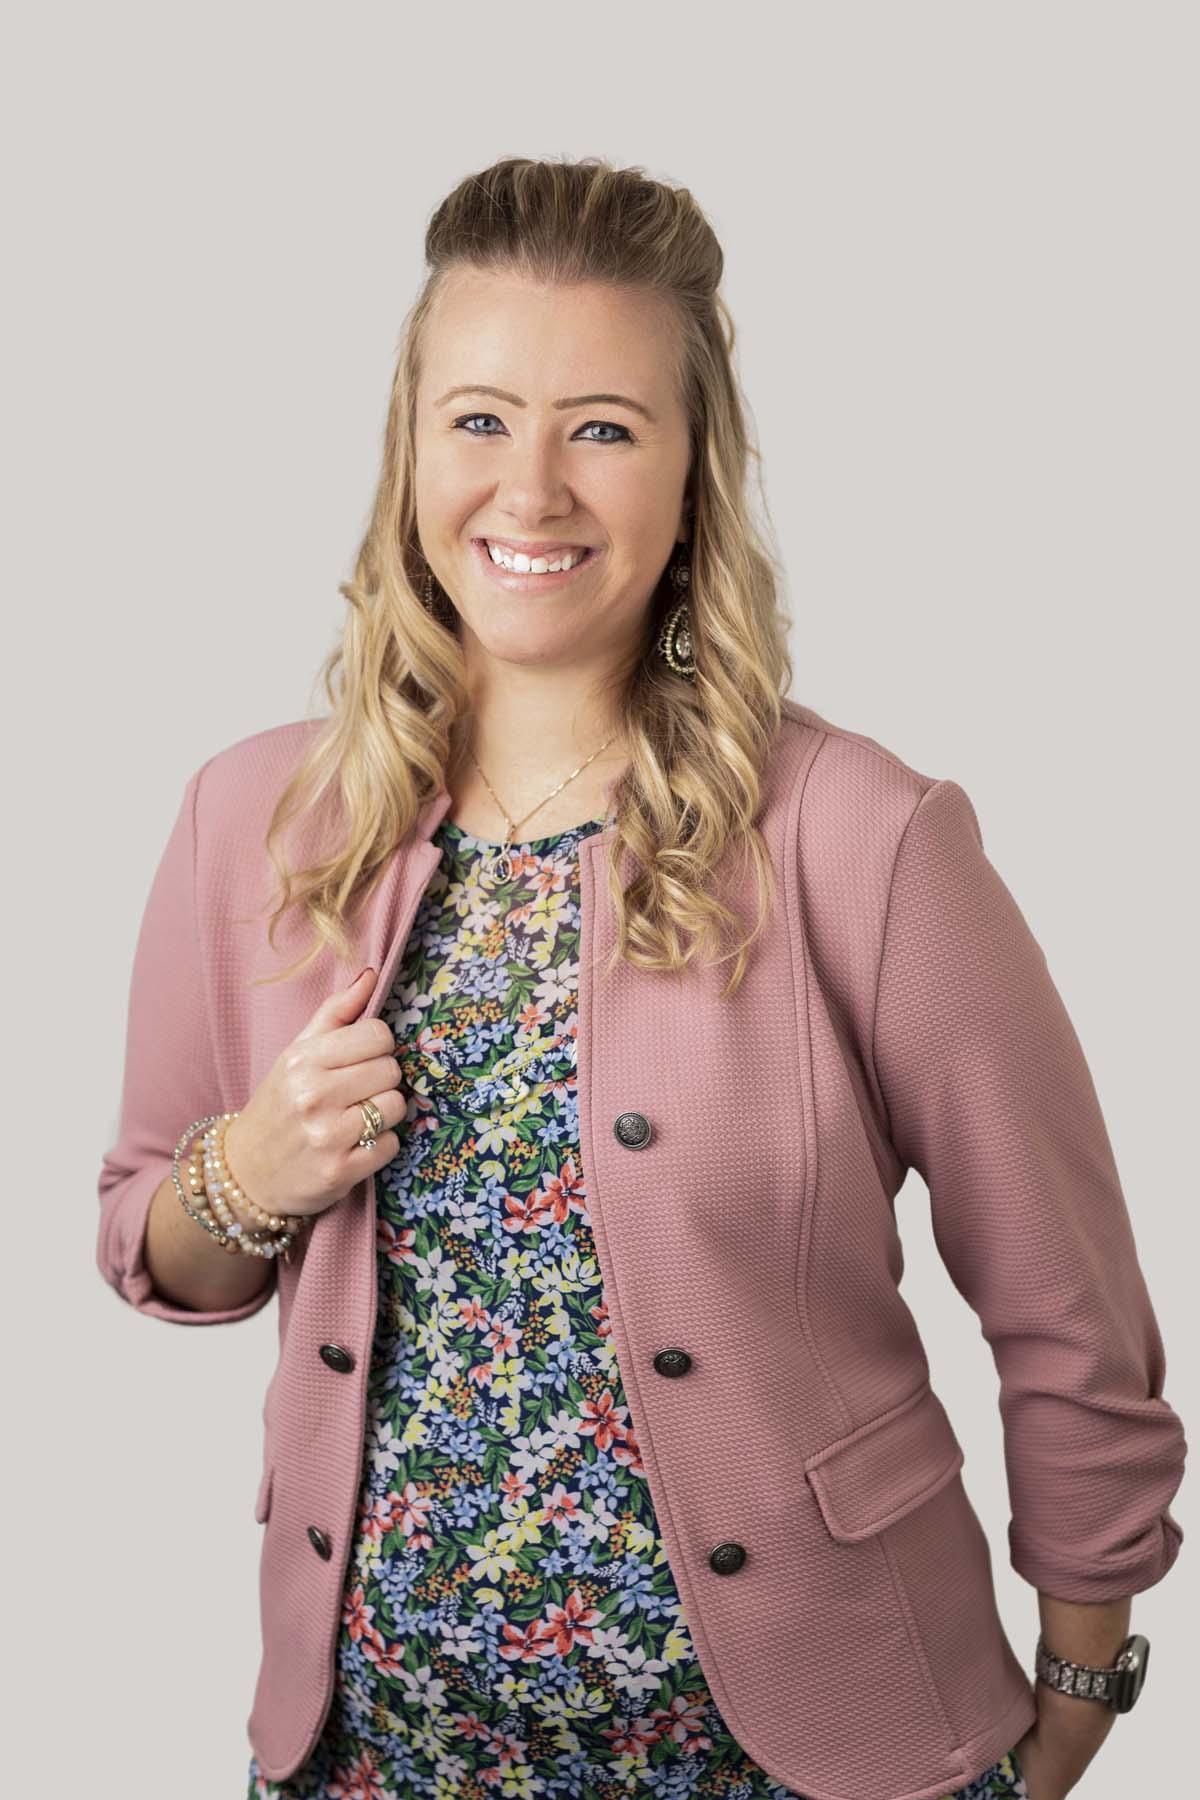 Krista Berg